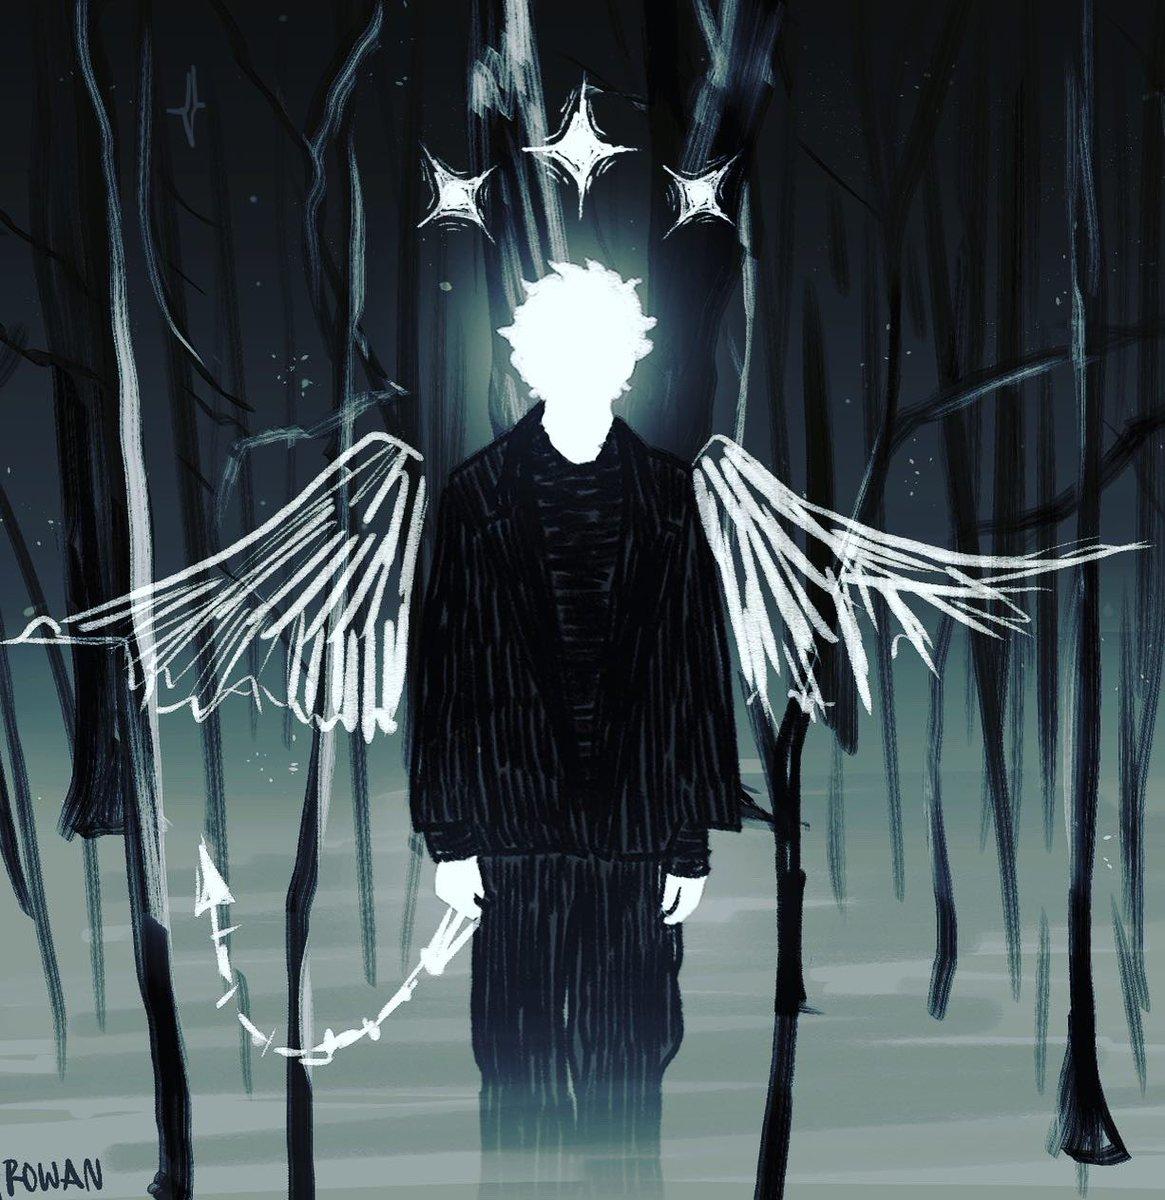 RT @shr0omlight: the phantom antiquarian  #wilbursootfanart #osmp  rts are the coolest ever https://t.co/tY5LsRUR9F